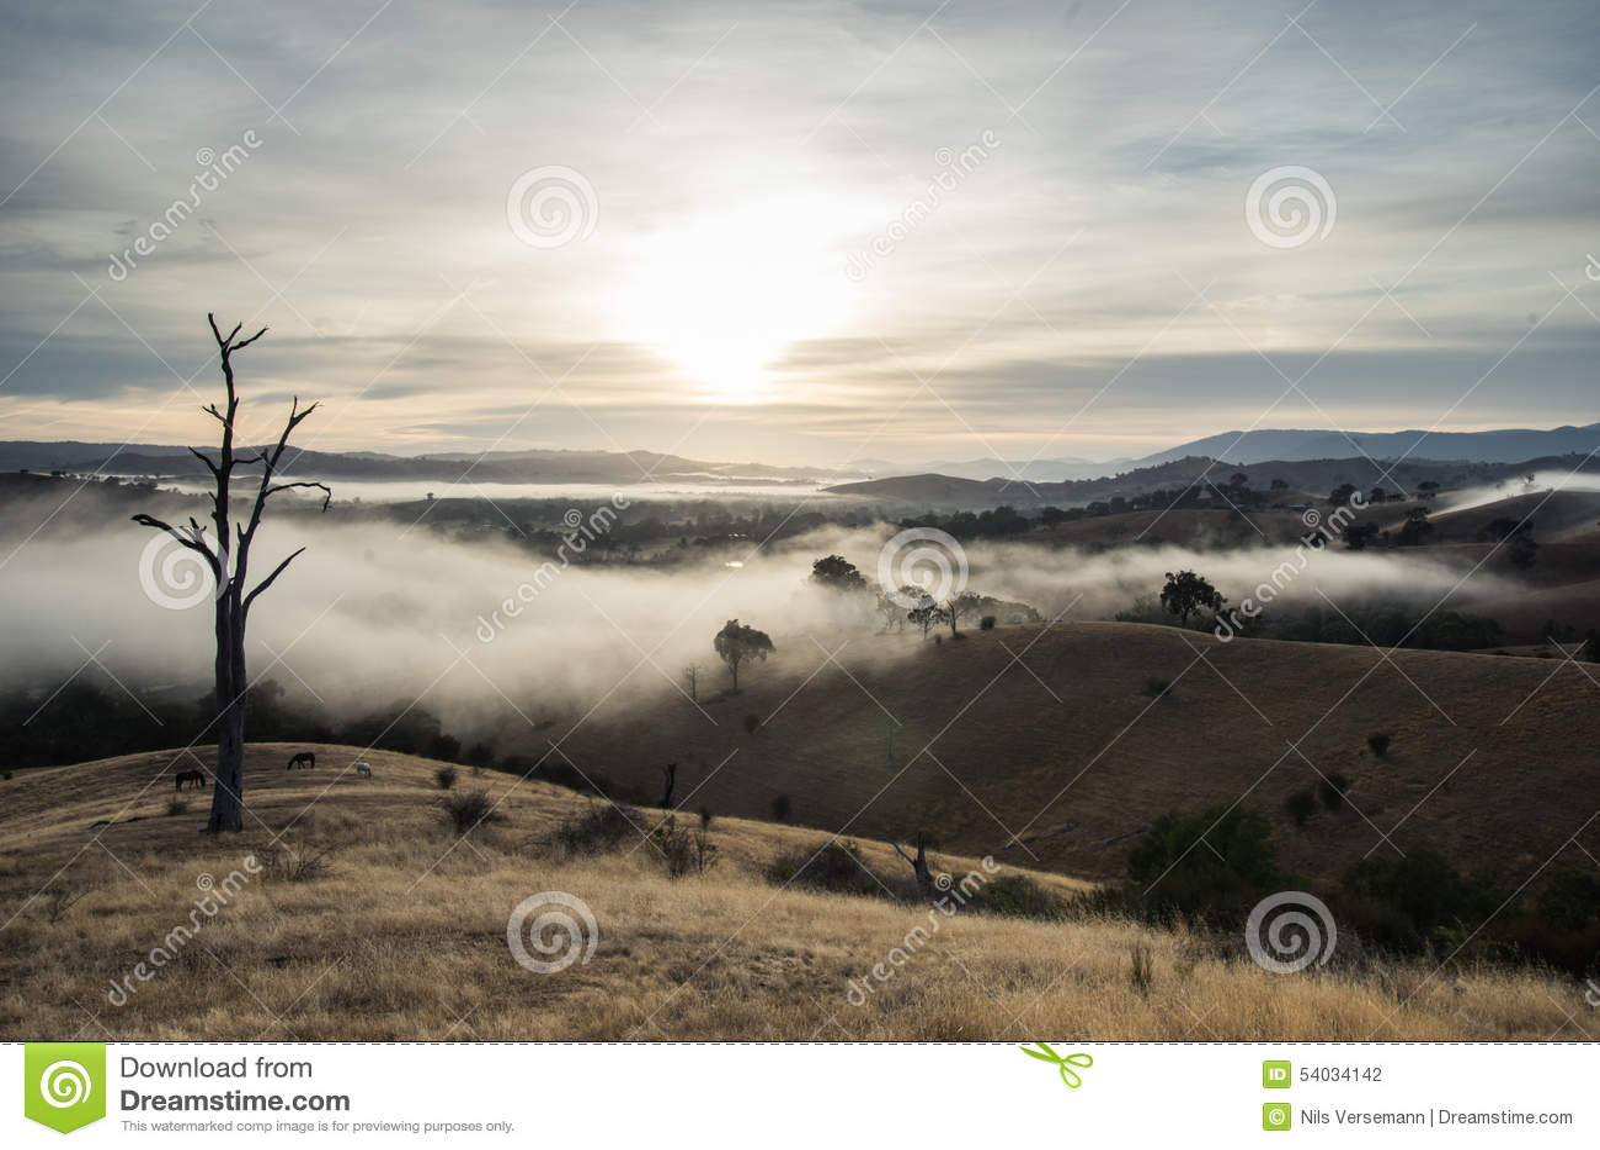 Morning Fog In Goulburn River Valley In Victoria Australia Stock Photo